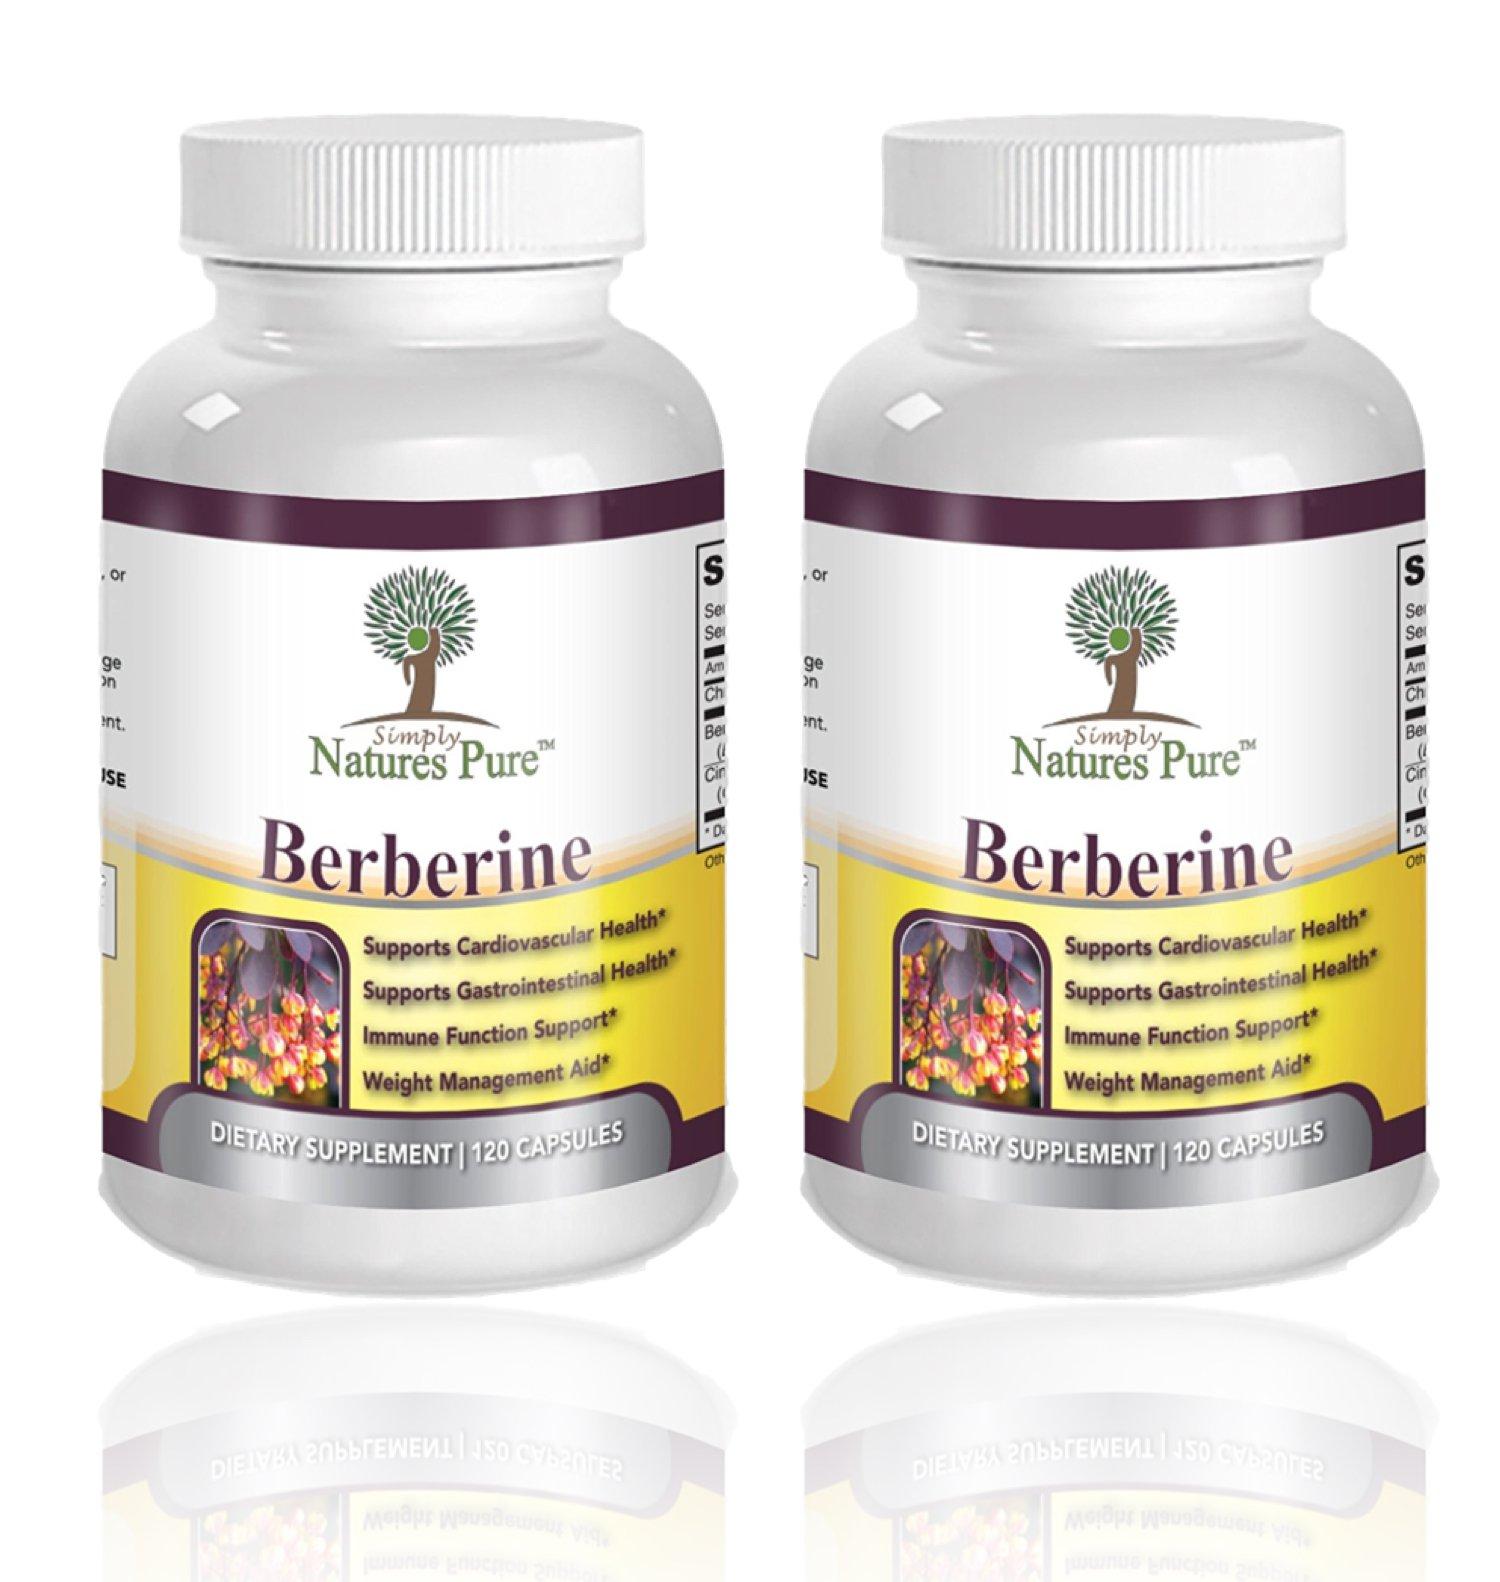 Premium Berberine HCl 500mg - 240 Capsules - Cardiovascular gastrointestinal Immune Weight Loss Support- Chromium Cinnamon